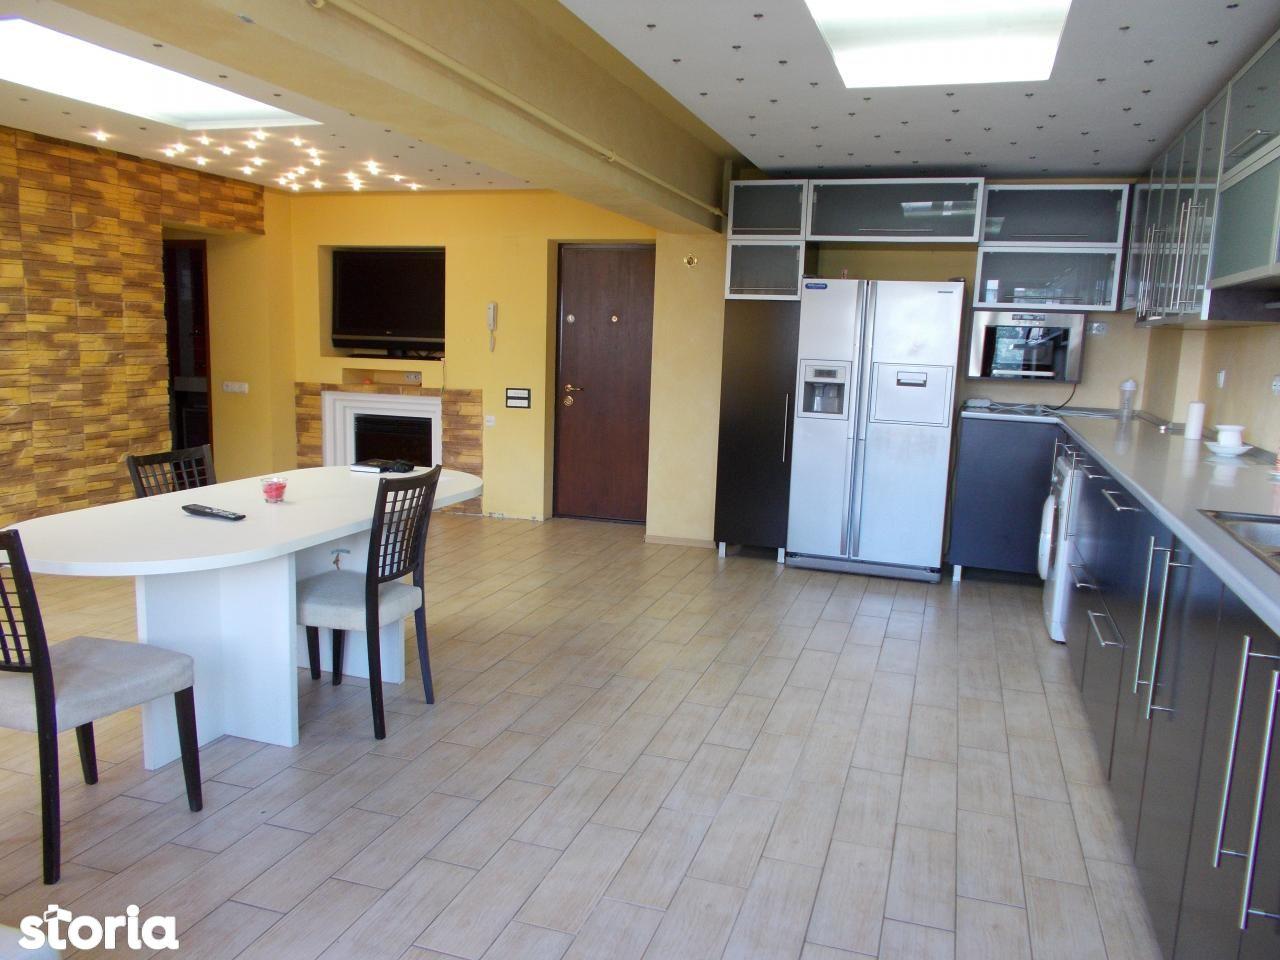 Apartament de vanzare, Brăila (judet), Cãlãrași 4 - Foto 3